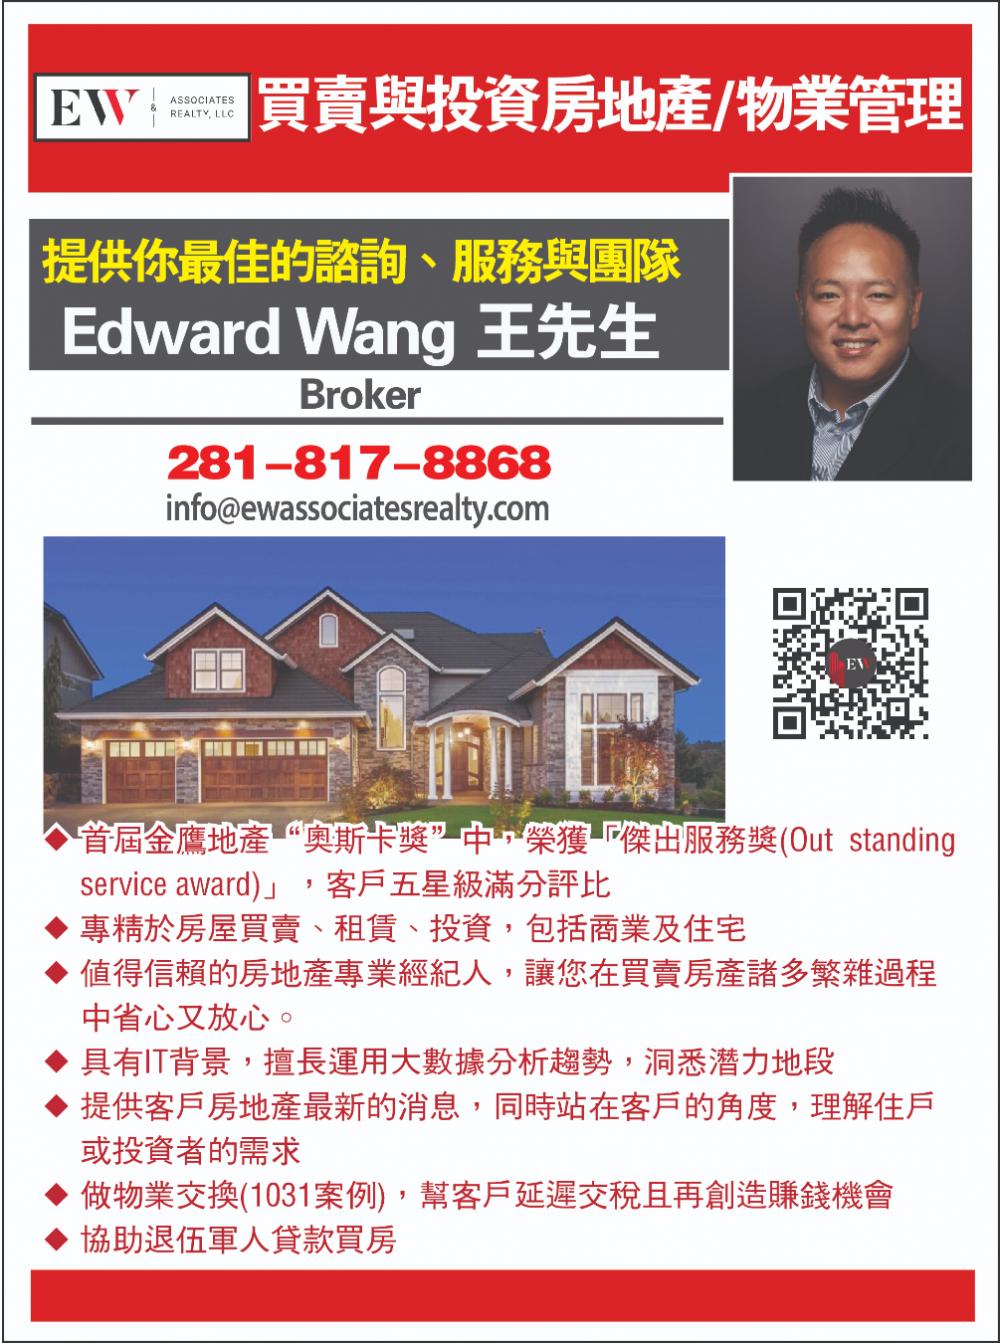 EDWARD WANG & ASSOCIATES REALTY